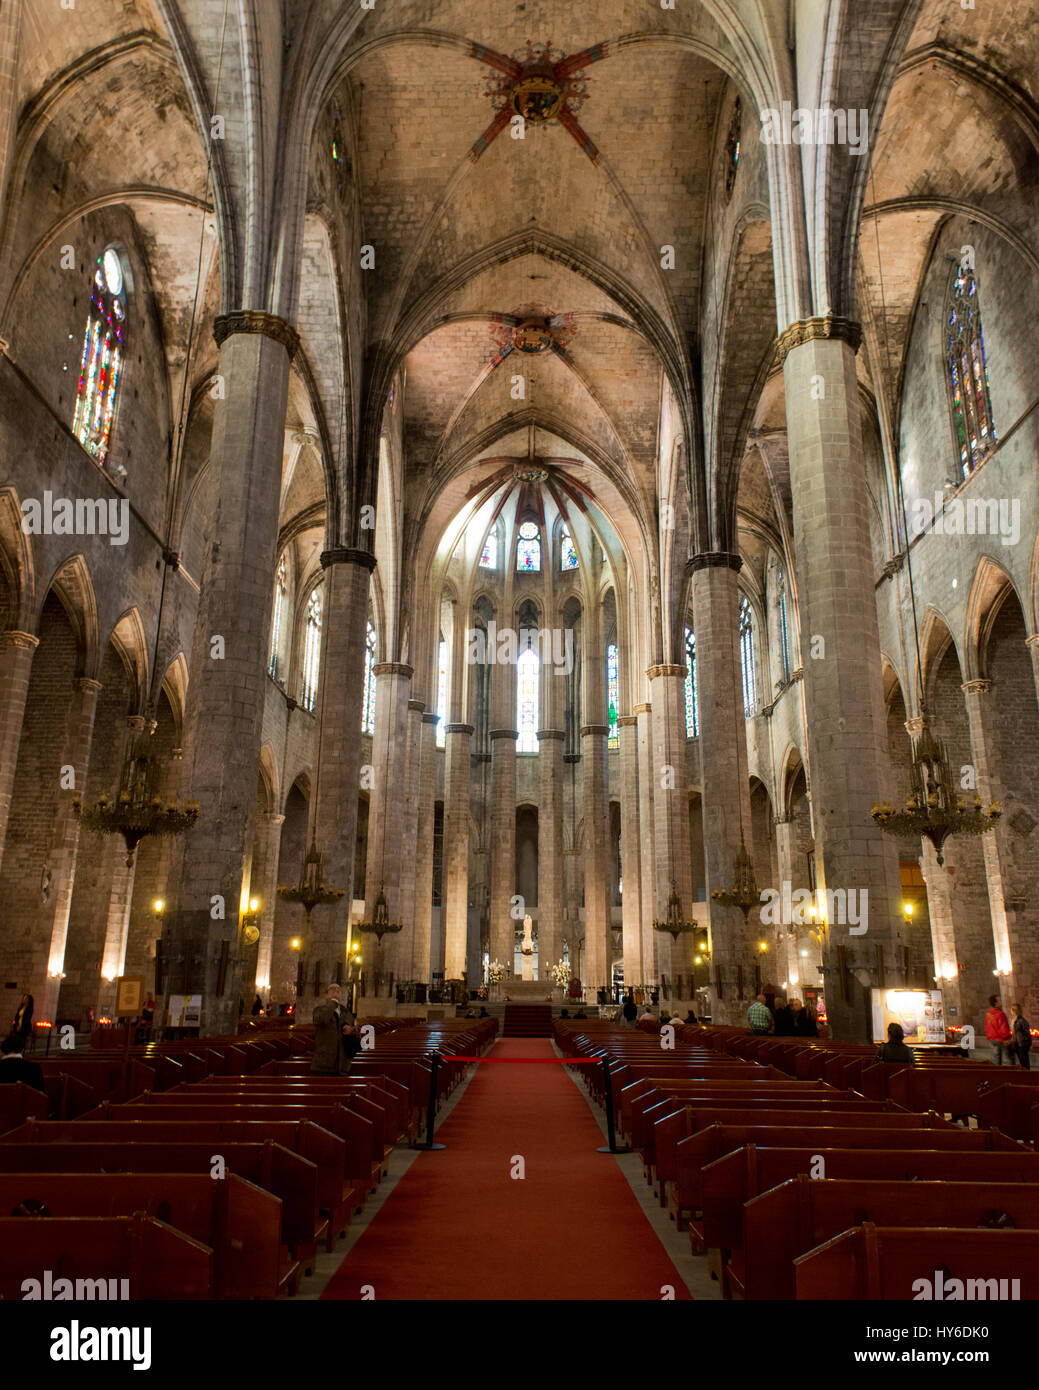 Nave with ribbed vault at La Catedral de la Santa Creu i Santa Eulàlia,Kathedrale von Barcelona, Barcelona, Catalonia, Stock Photo